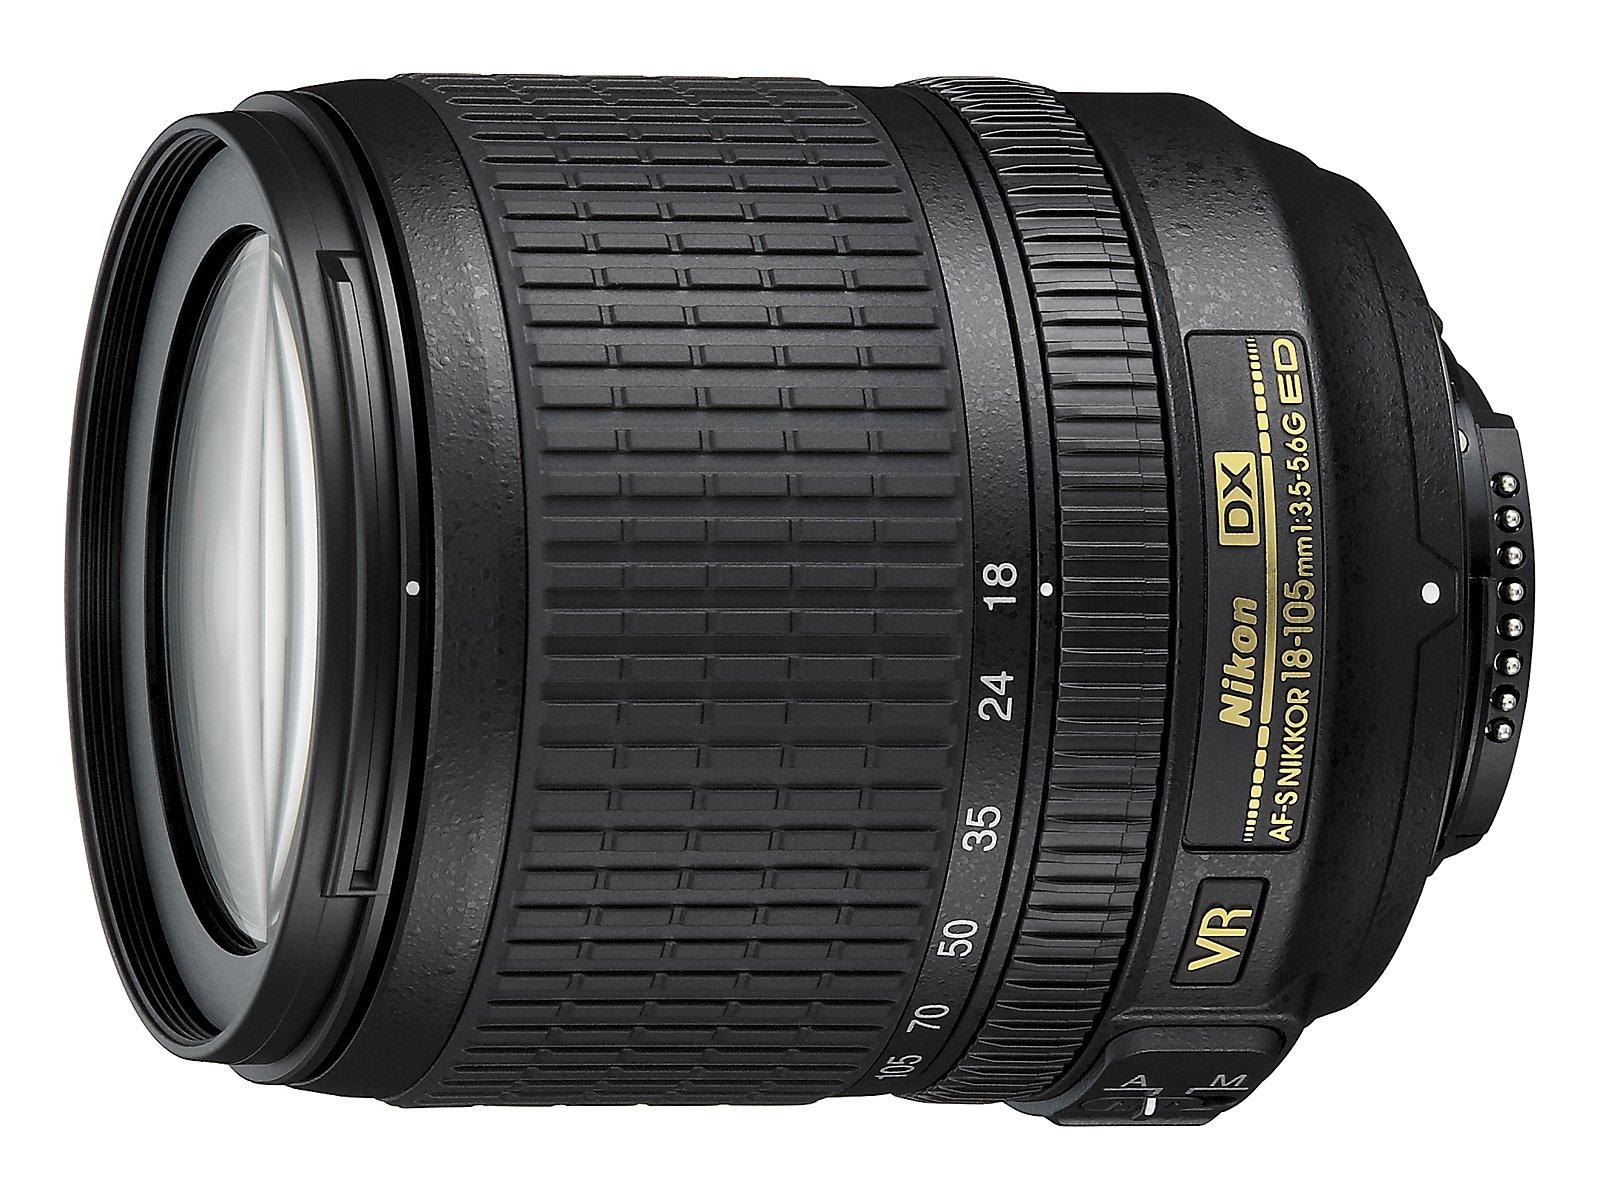 Nikon Obiettivo Nikkor AF-S DX 18-105 mm f/3.5-5.6G ED VR, Nero [Nital Card: 4 Anni di Garanzia]